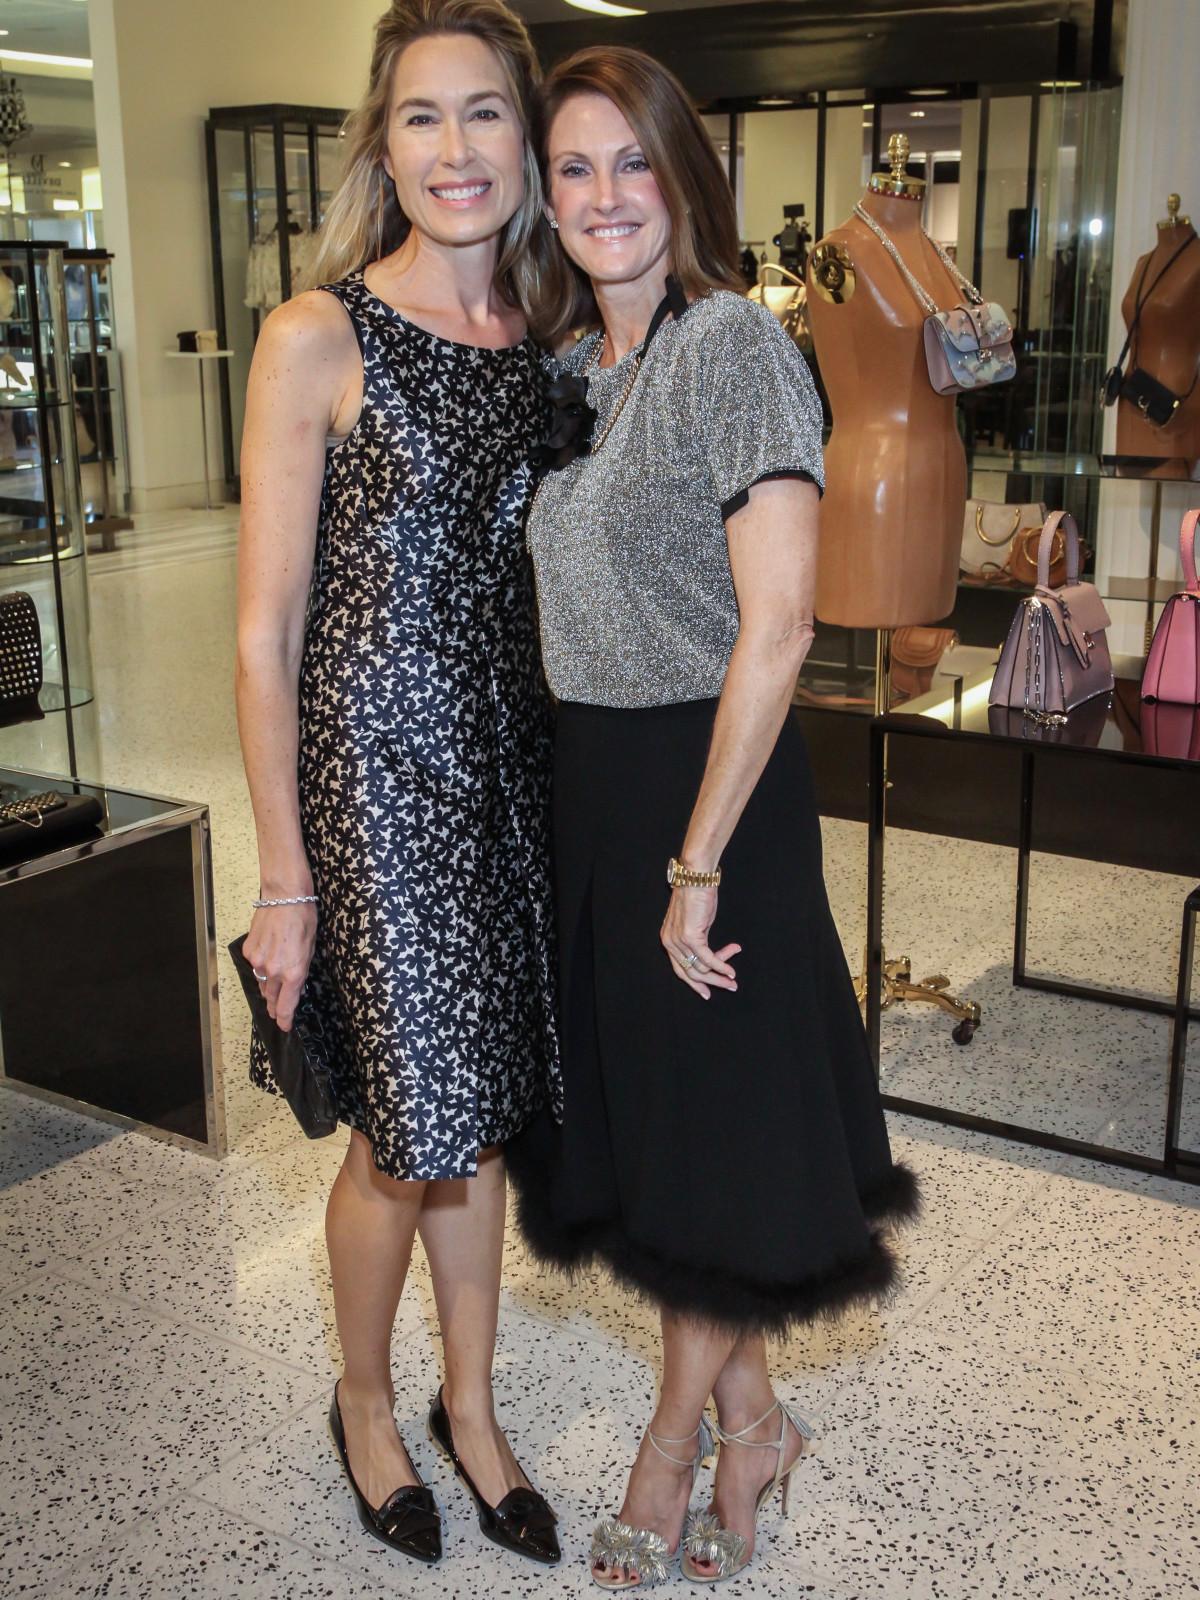 Lisa Francisco and Stephanie Tsuru at Women of Distinction announcment party